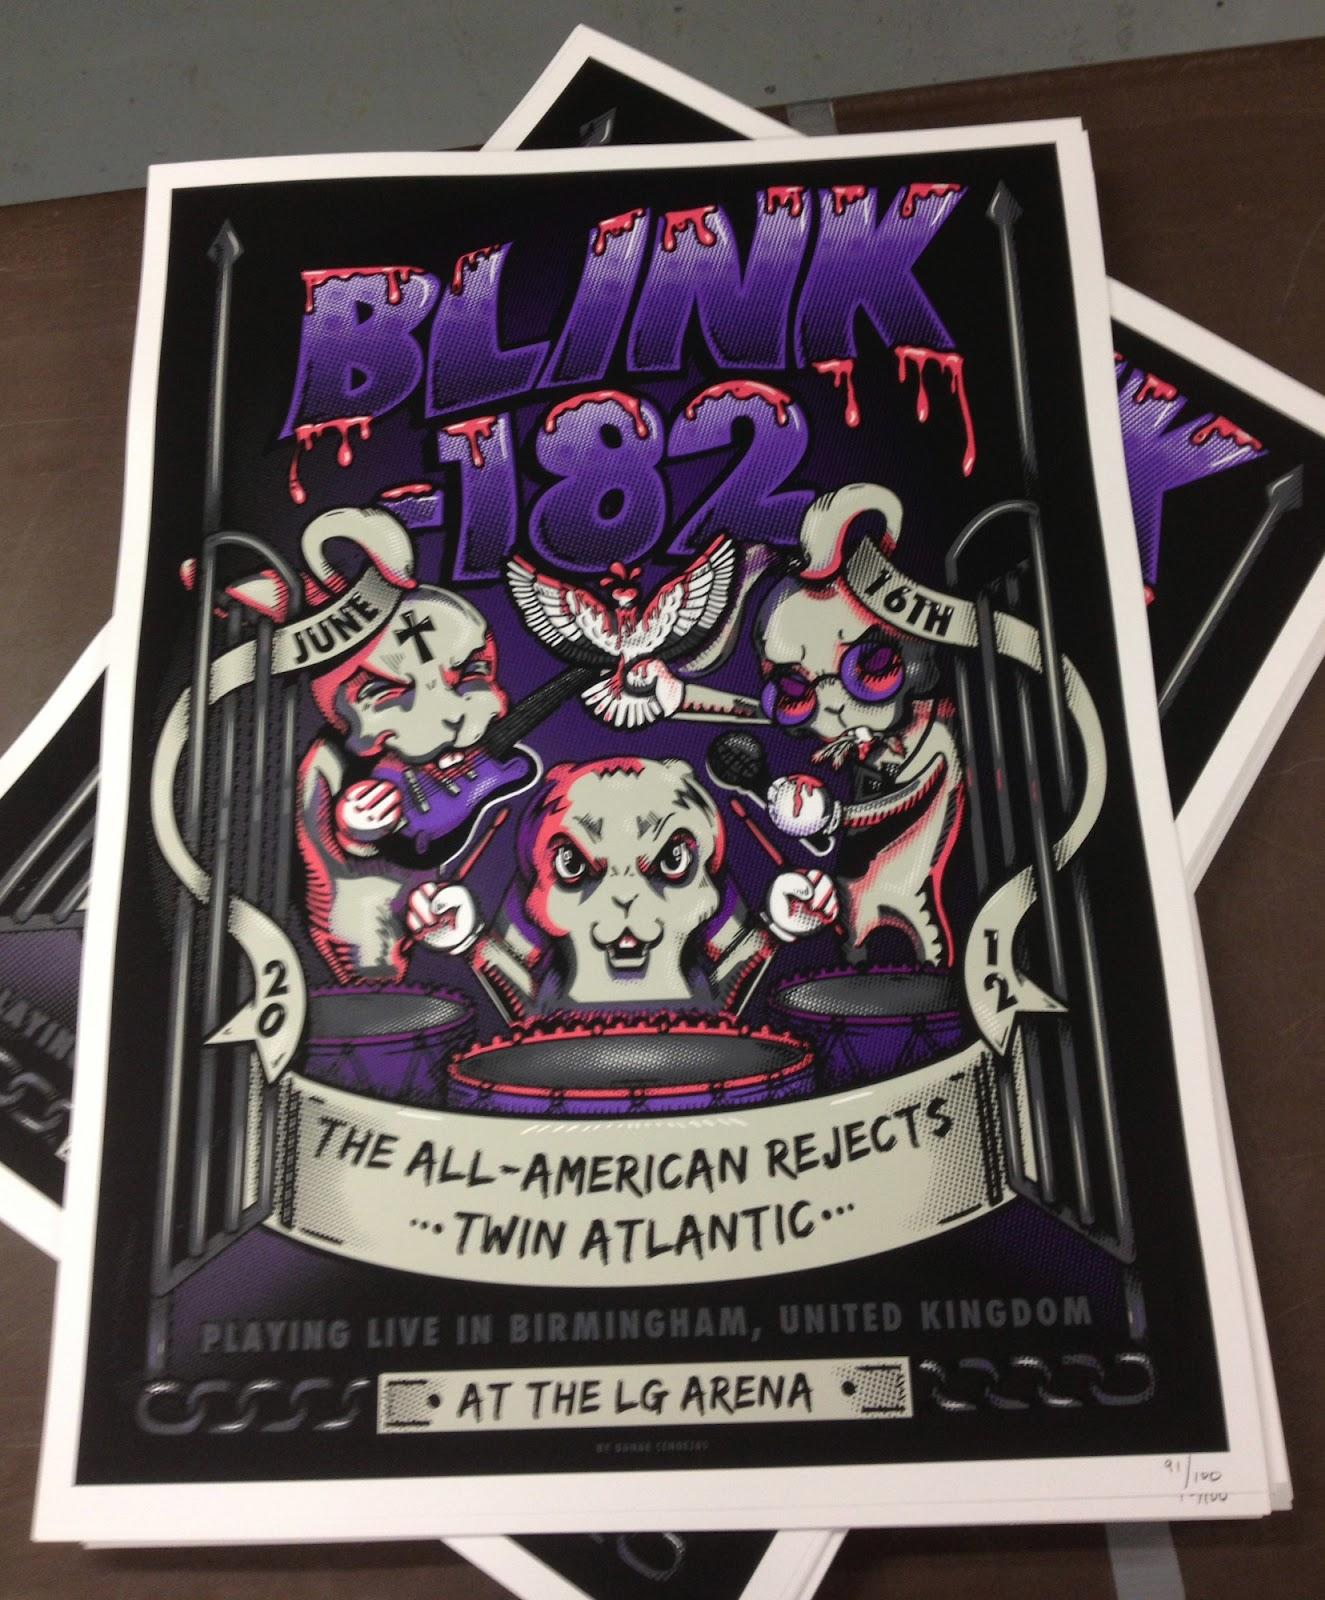 BLINK 182 concert gig poster 20 YEARS 1992-2012 silkscreen print Emek